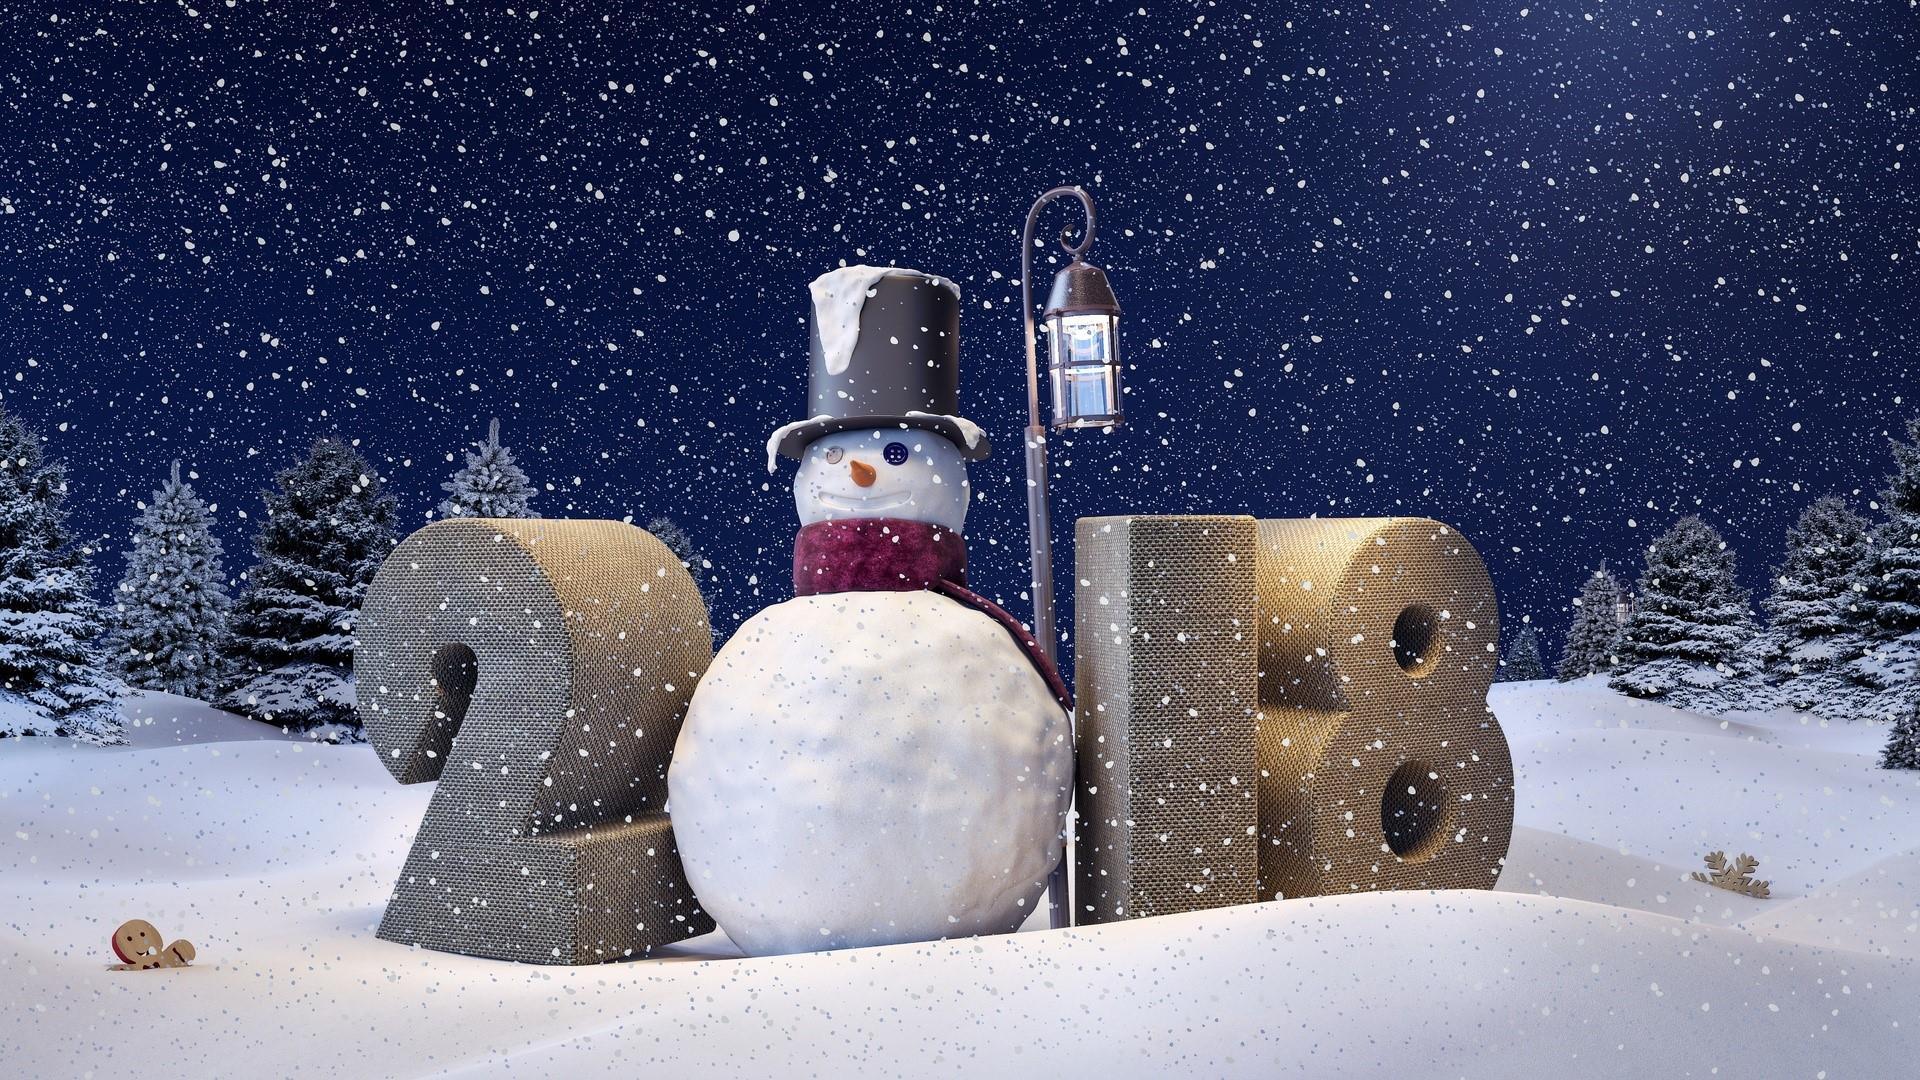 2018 New Year Snowman ⛄ wallpaper